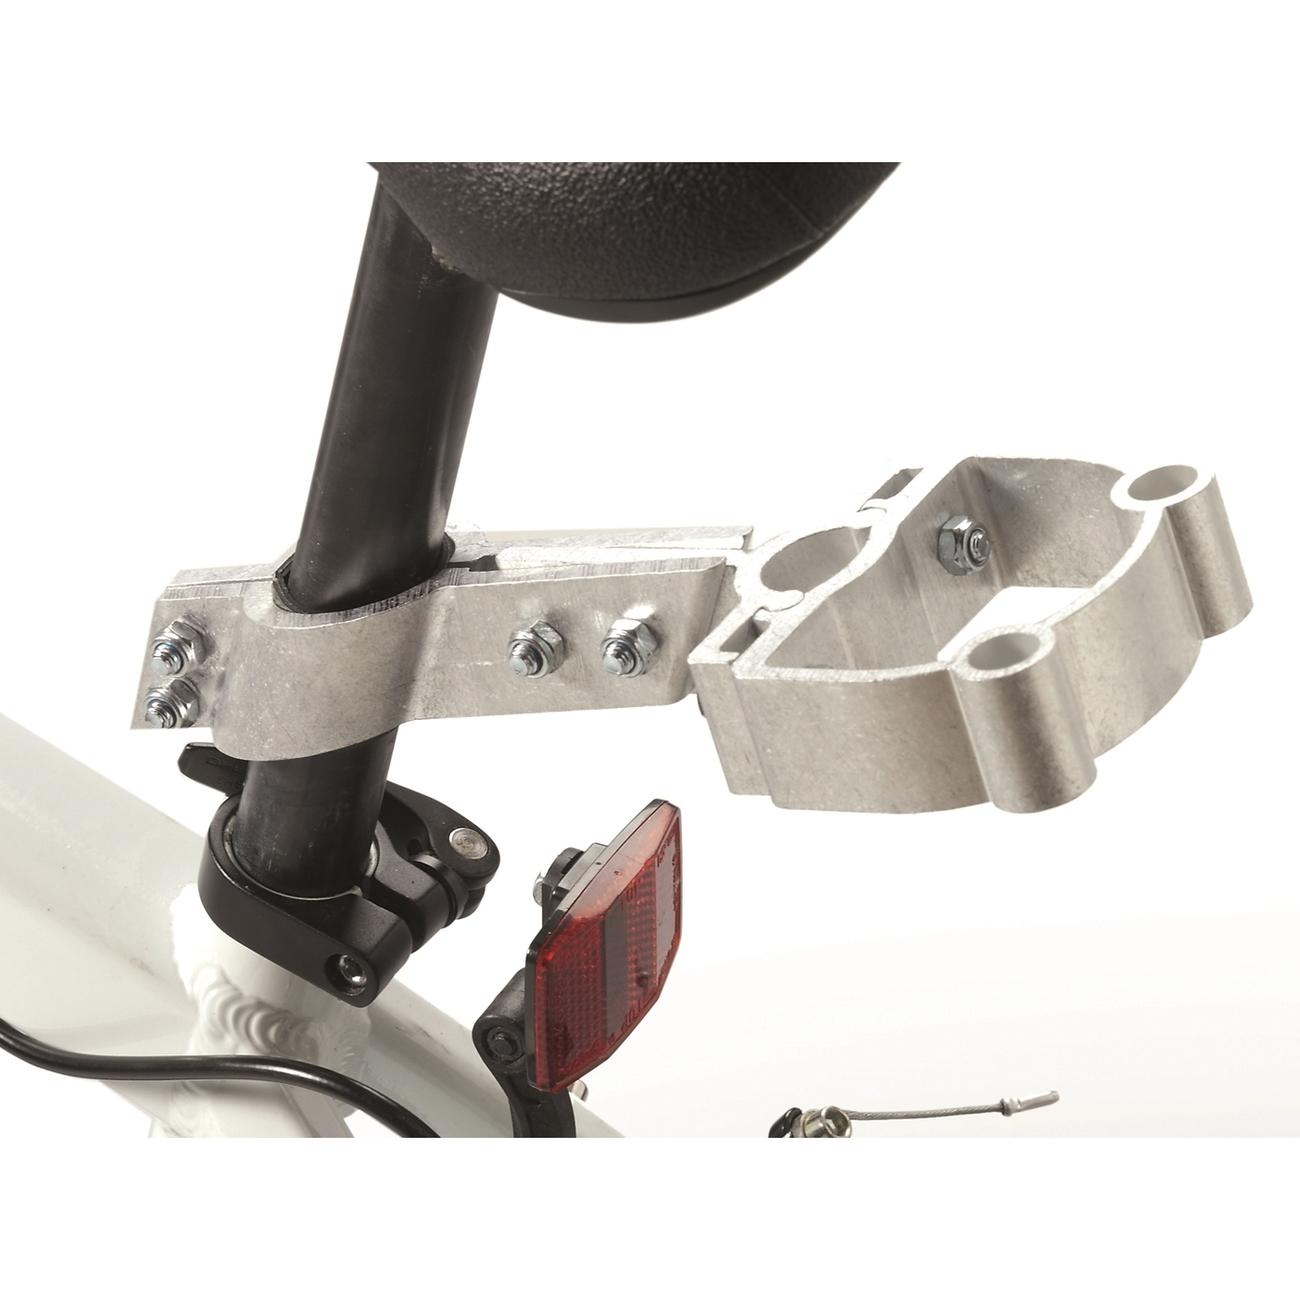 Aumüller Universalhalter Nr. 161 für Fahrradkörbe